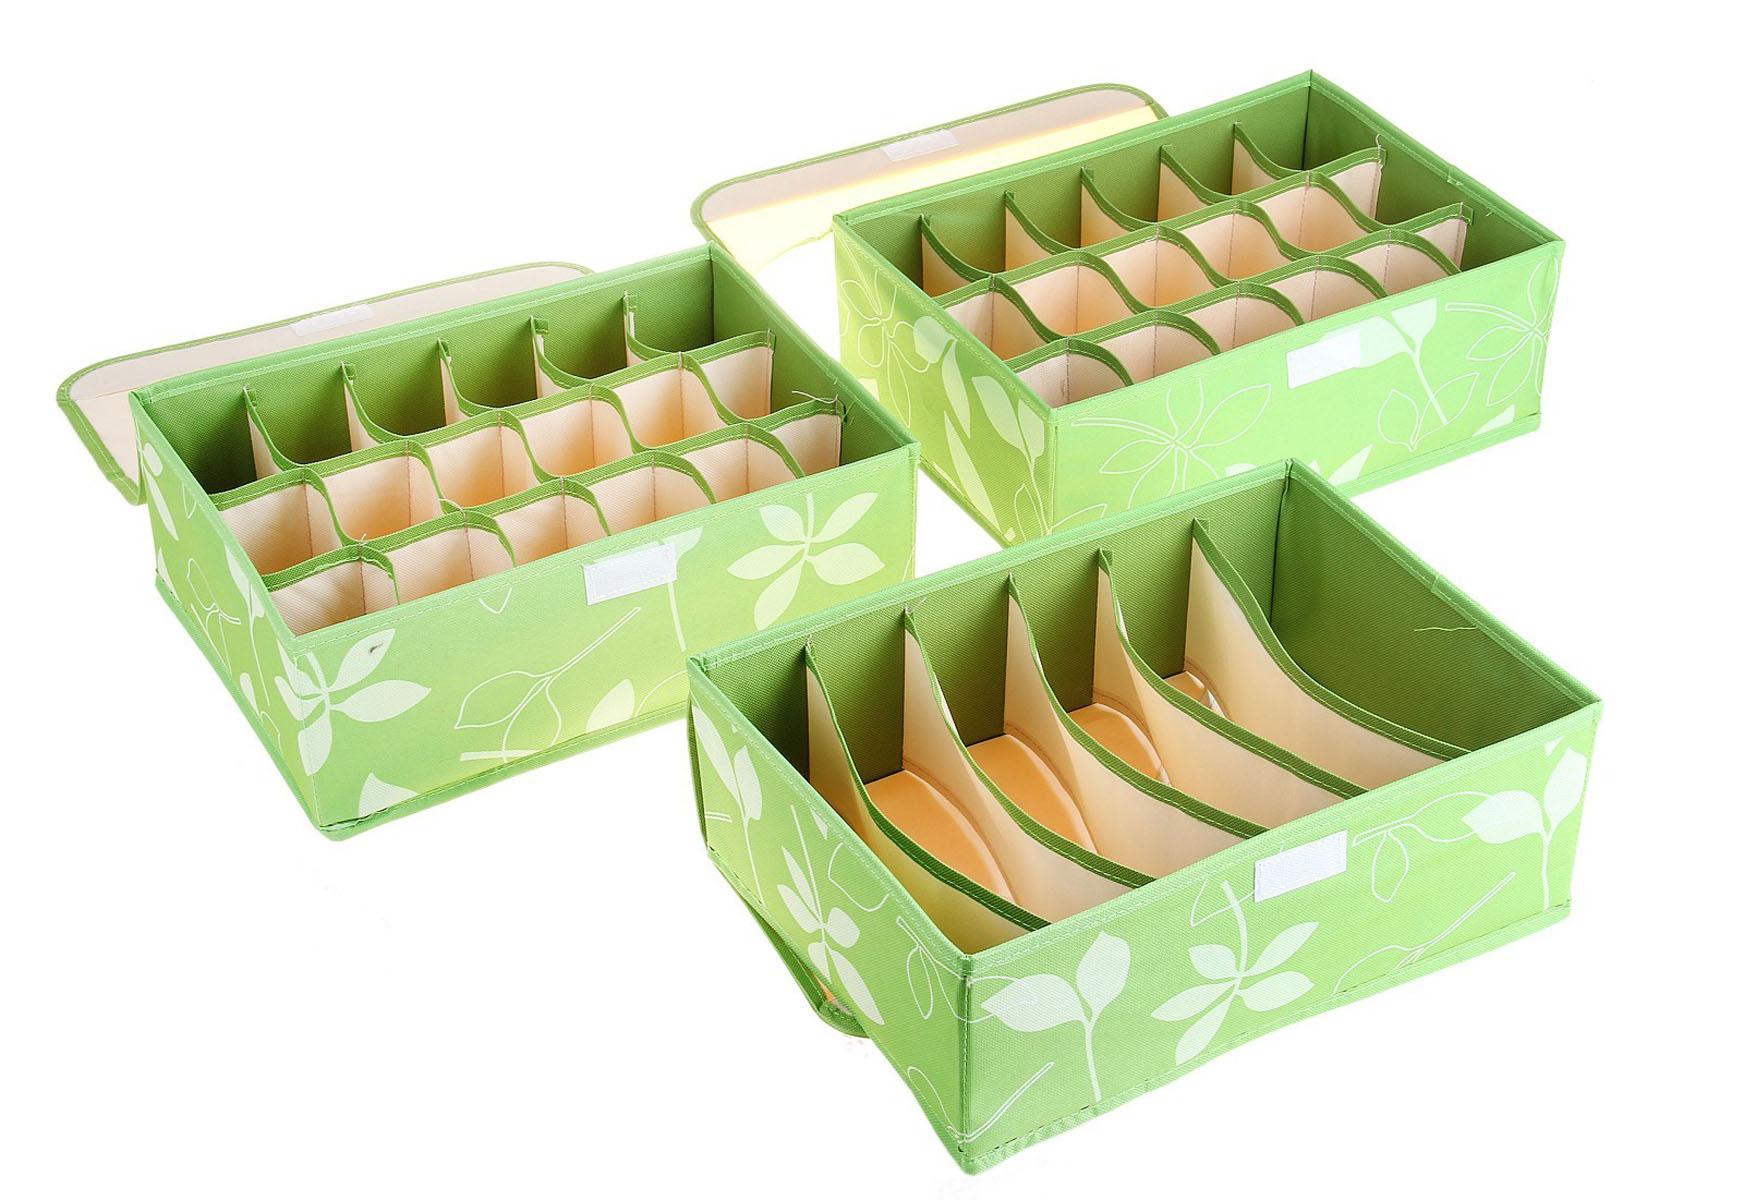 Кофр для мелких вещей Листочки, цвет: зеленый, 32 х 24 х 12 см, 3 шт. 760569760569